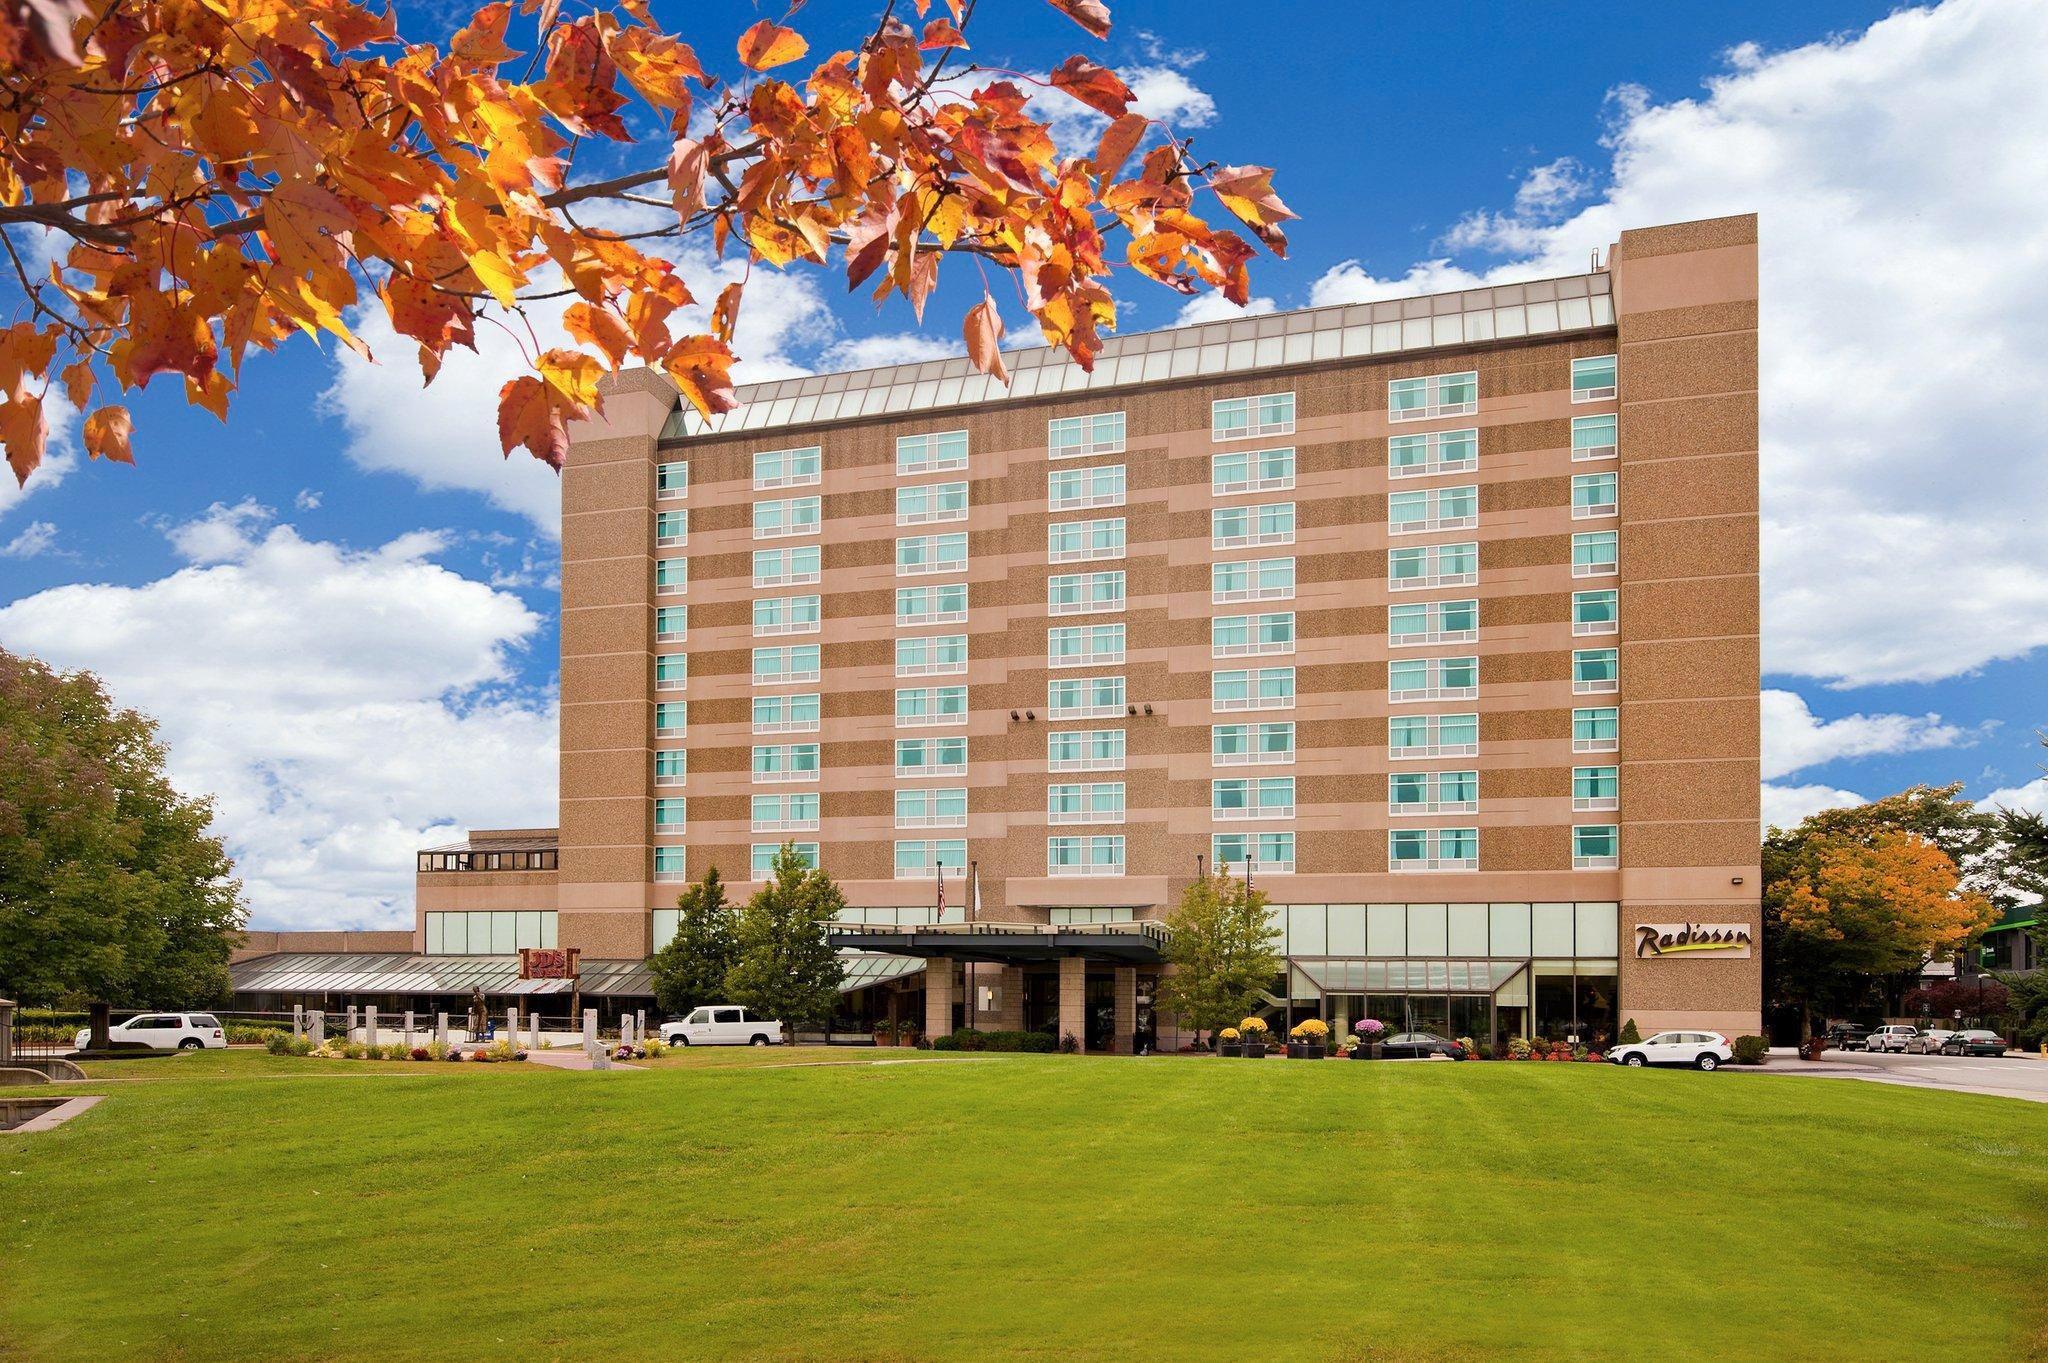 Radisson Hotel Manchester